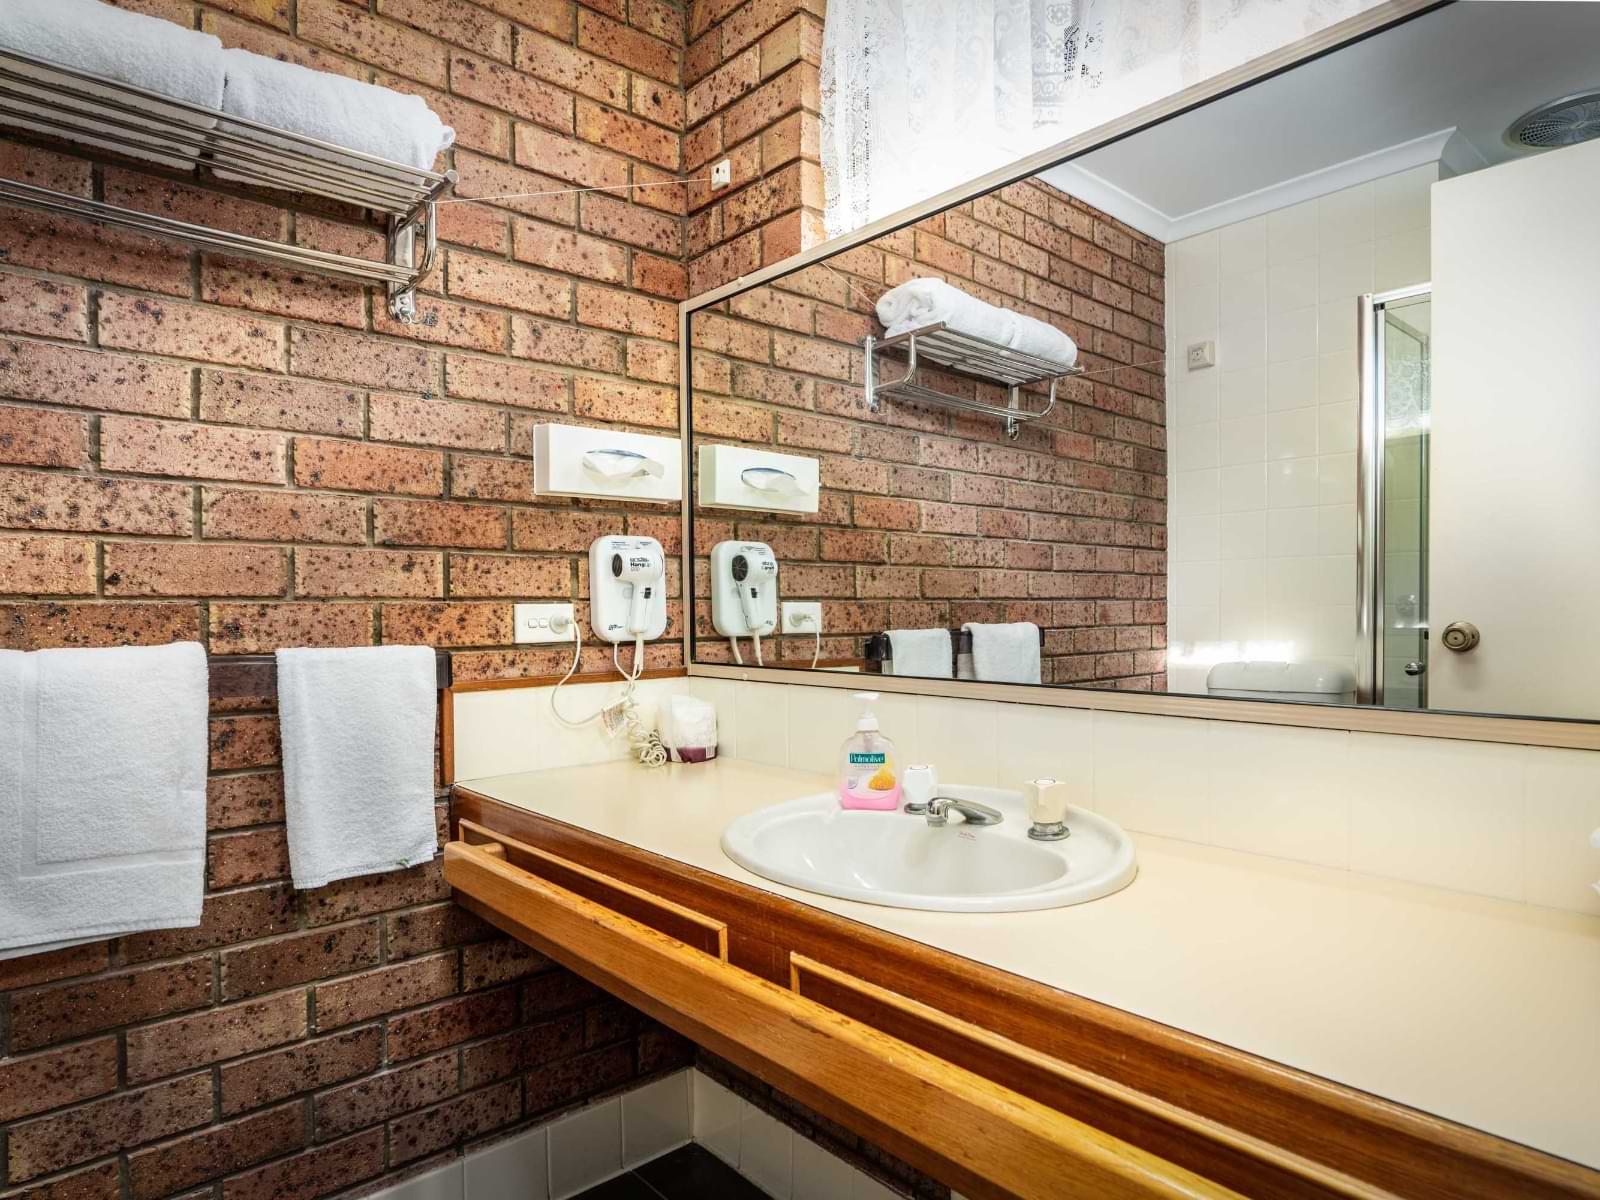 6-Bathroom-6 Large Suite-sRGB@2x